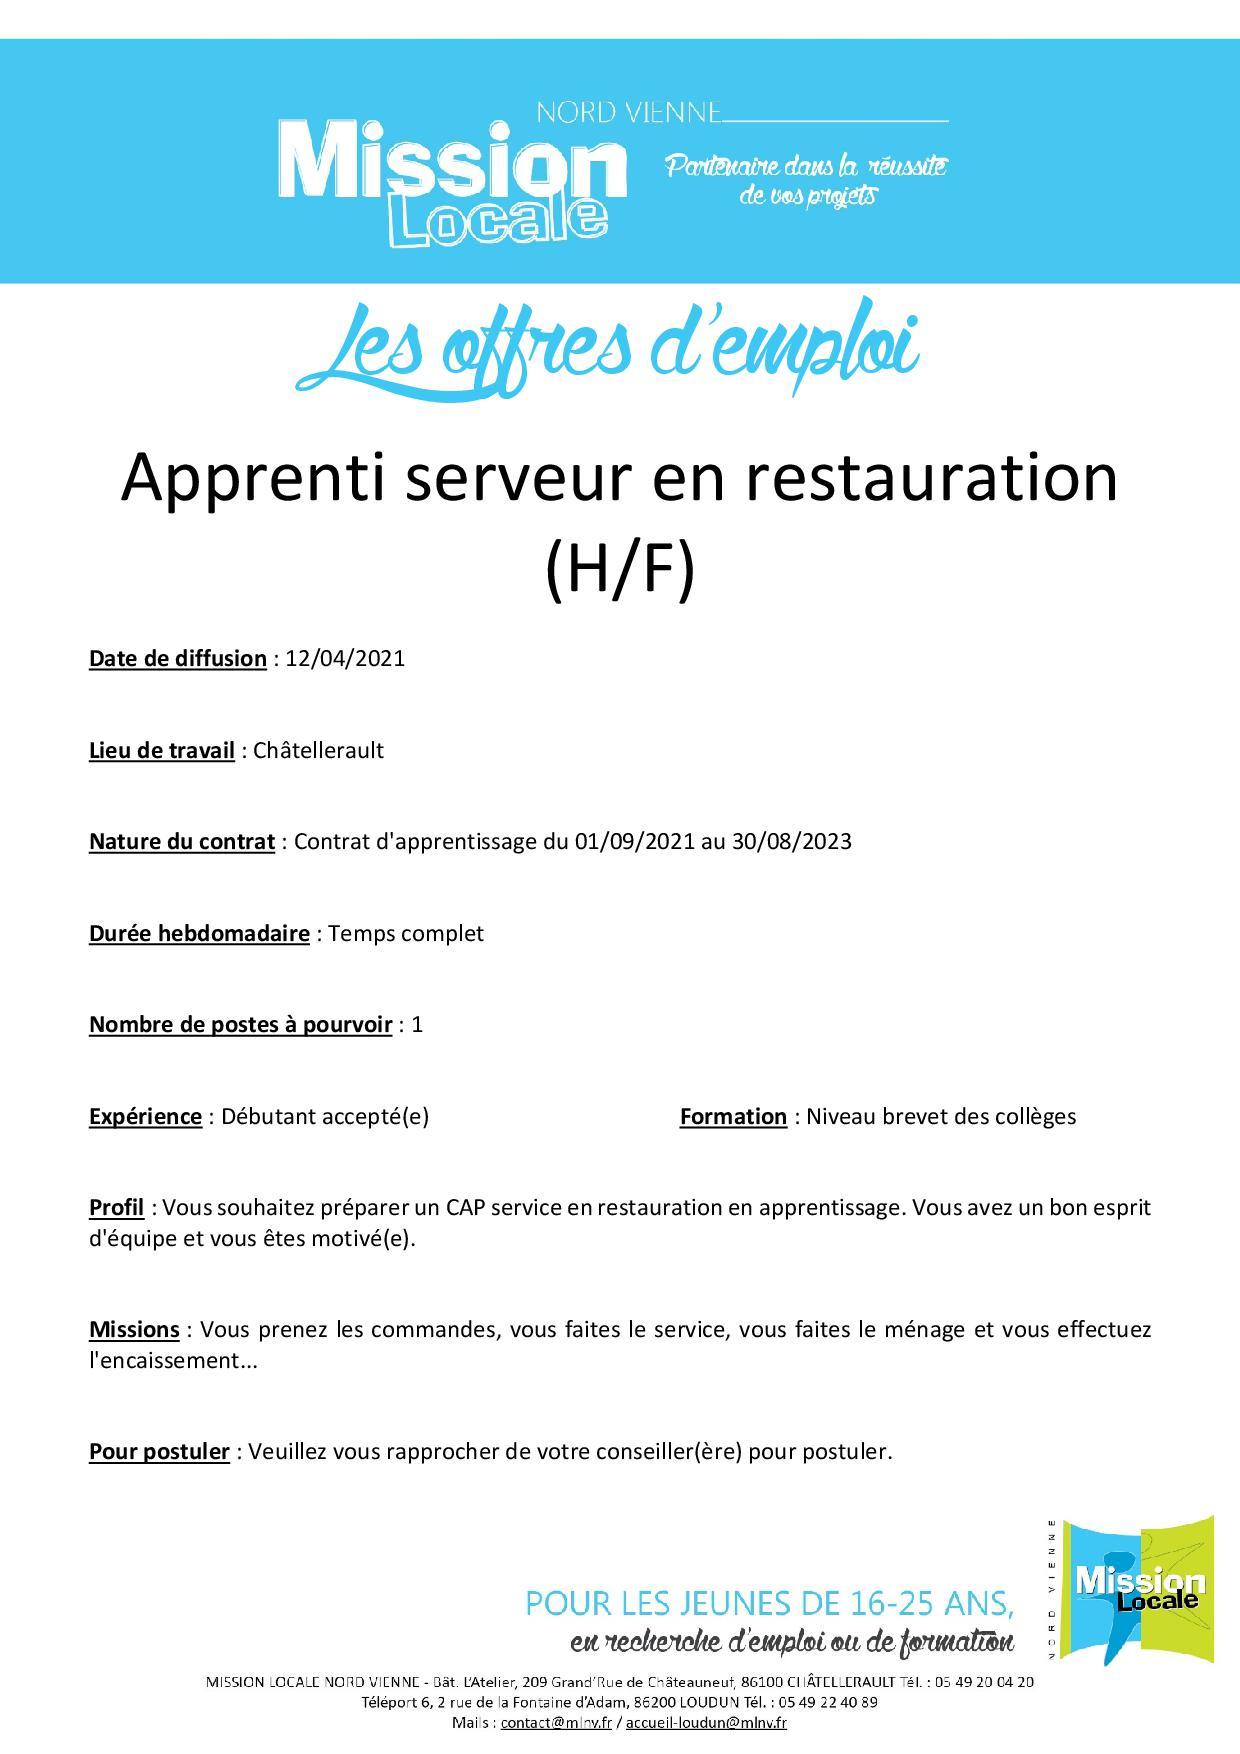 Apprenti serveur en restauration (H/F)